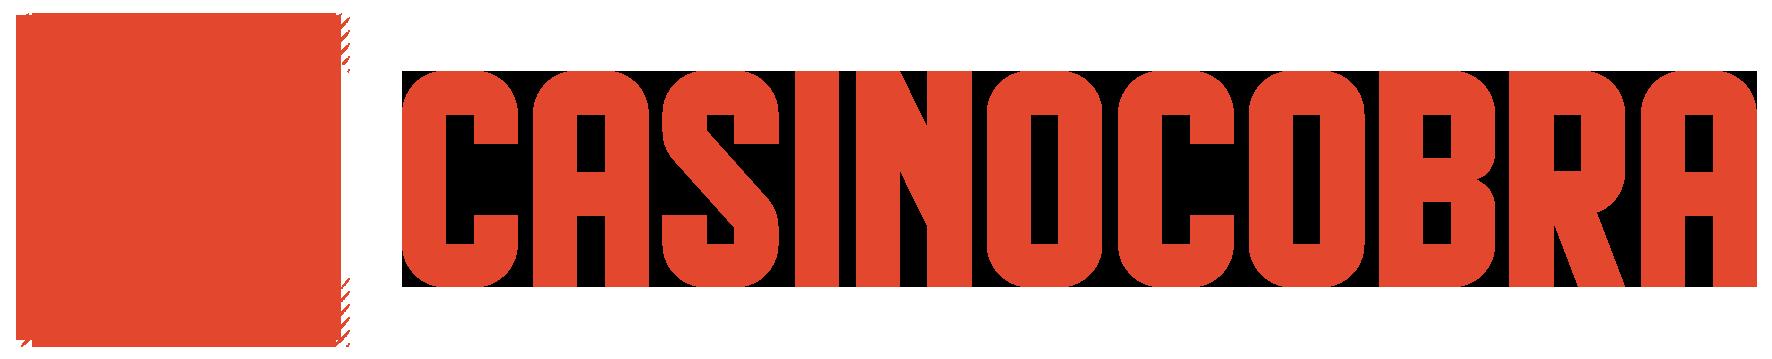 Best Online Casinos | Safe & Trusted Sites | CasinoCobra.com